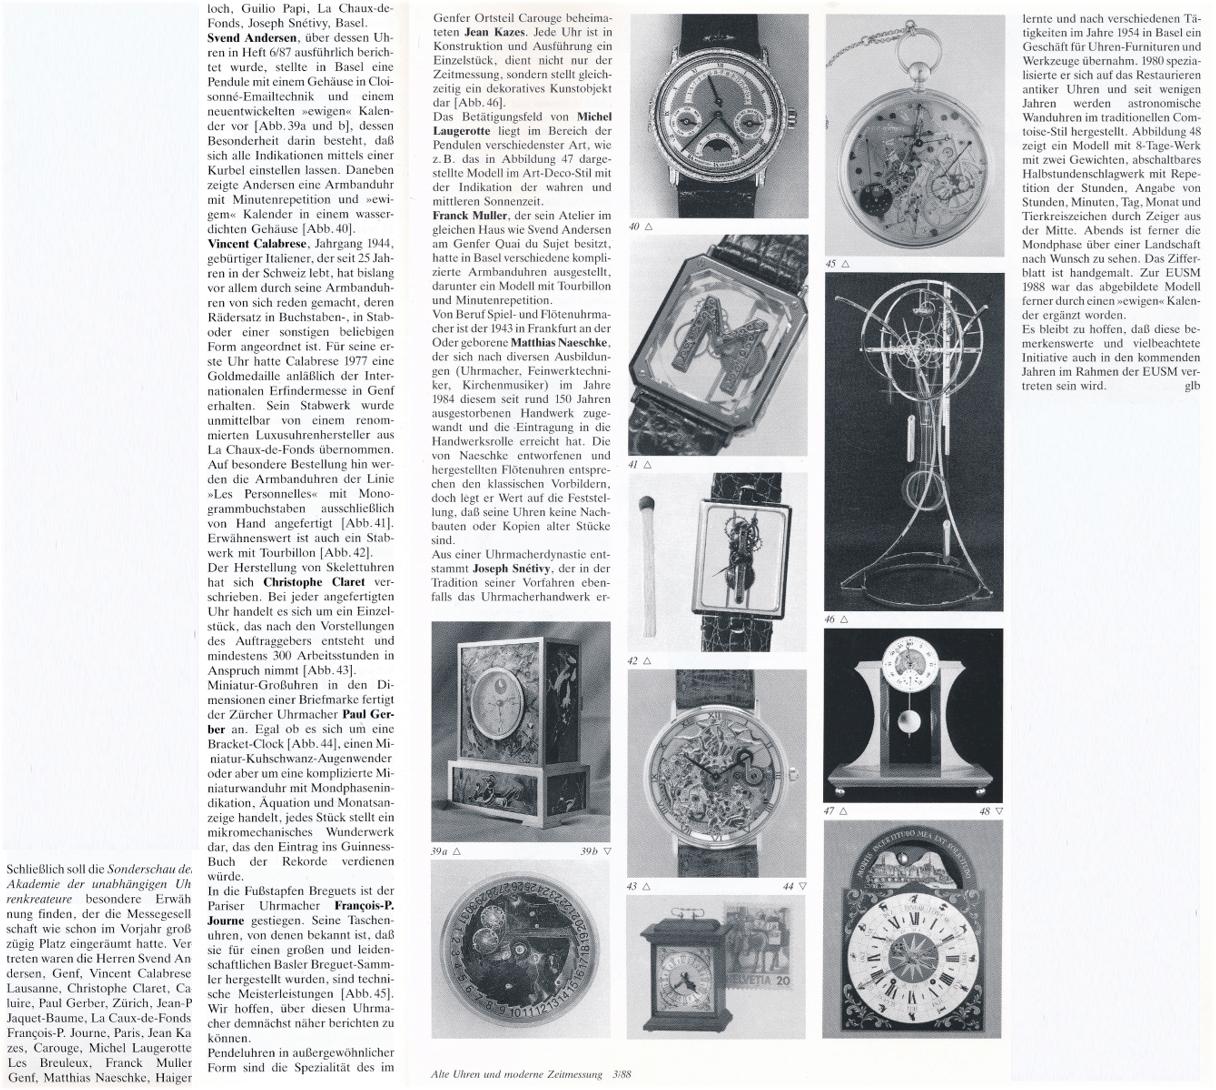 Bericht GLB Klassik Uhren AHCI 1988